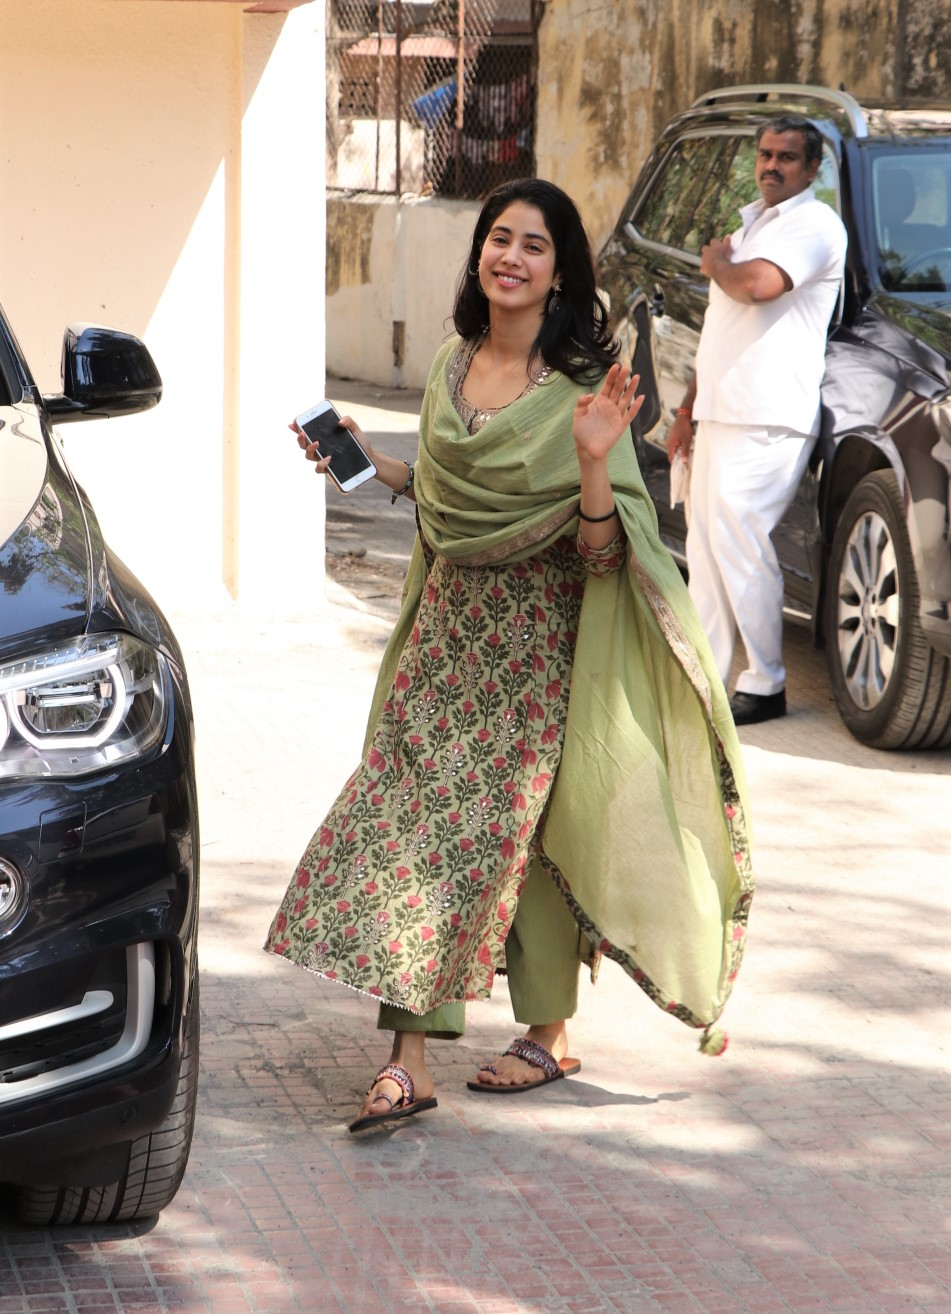 Janhvi Kapoor, Malaika Arora, Ananya Panday And More: Check Out Their Gym Looks!